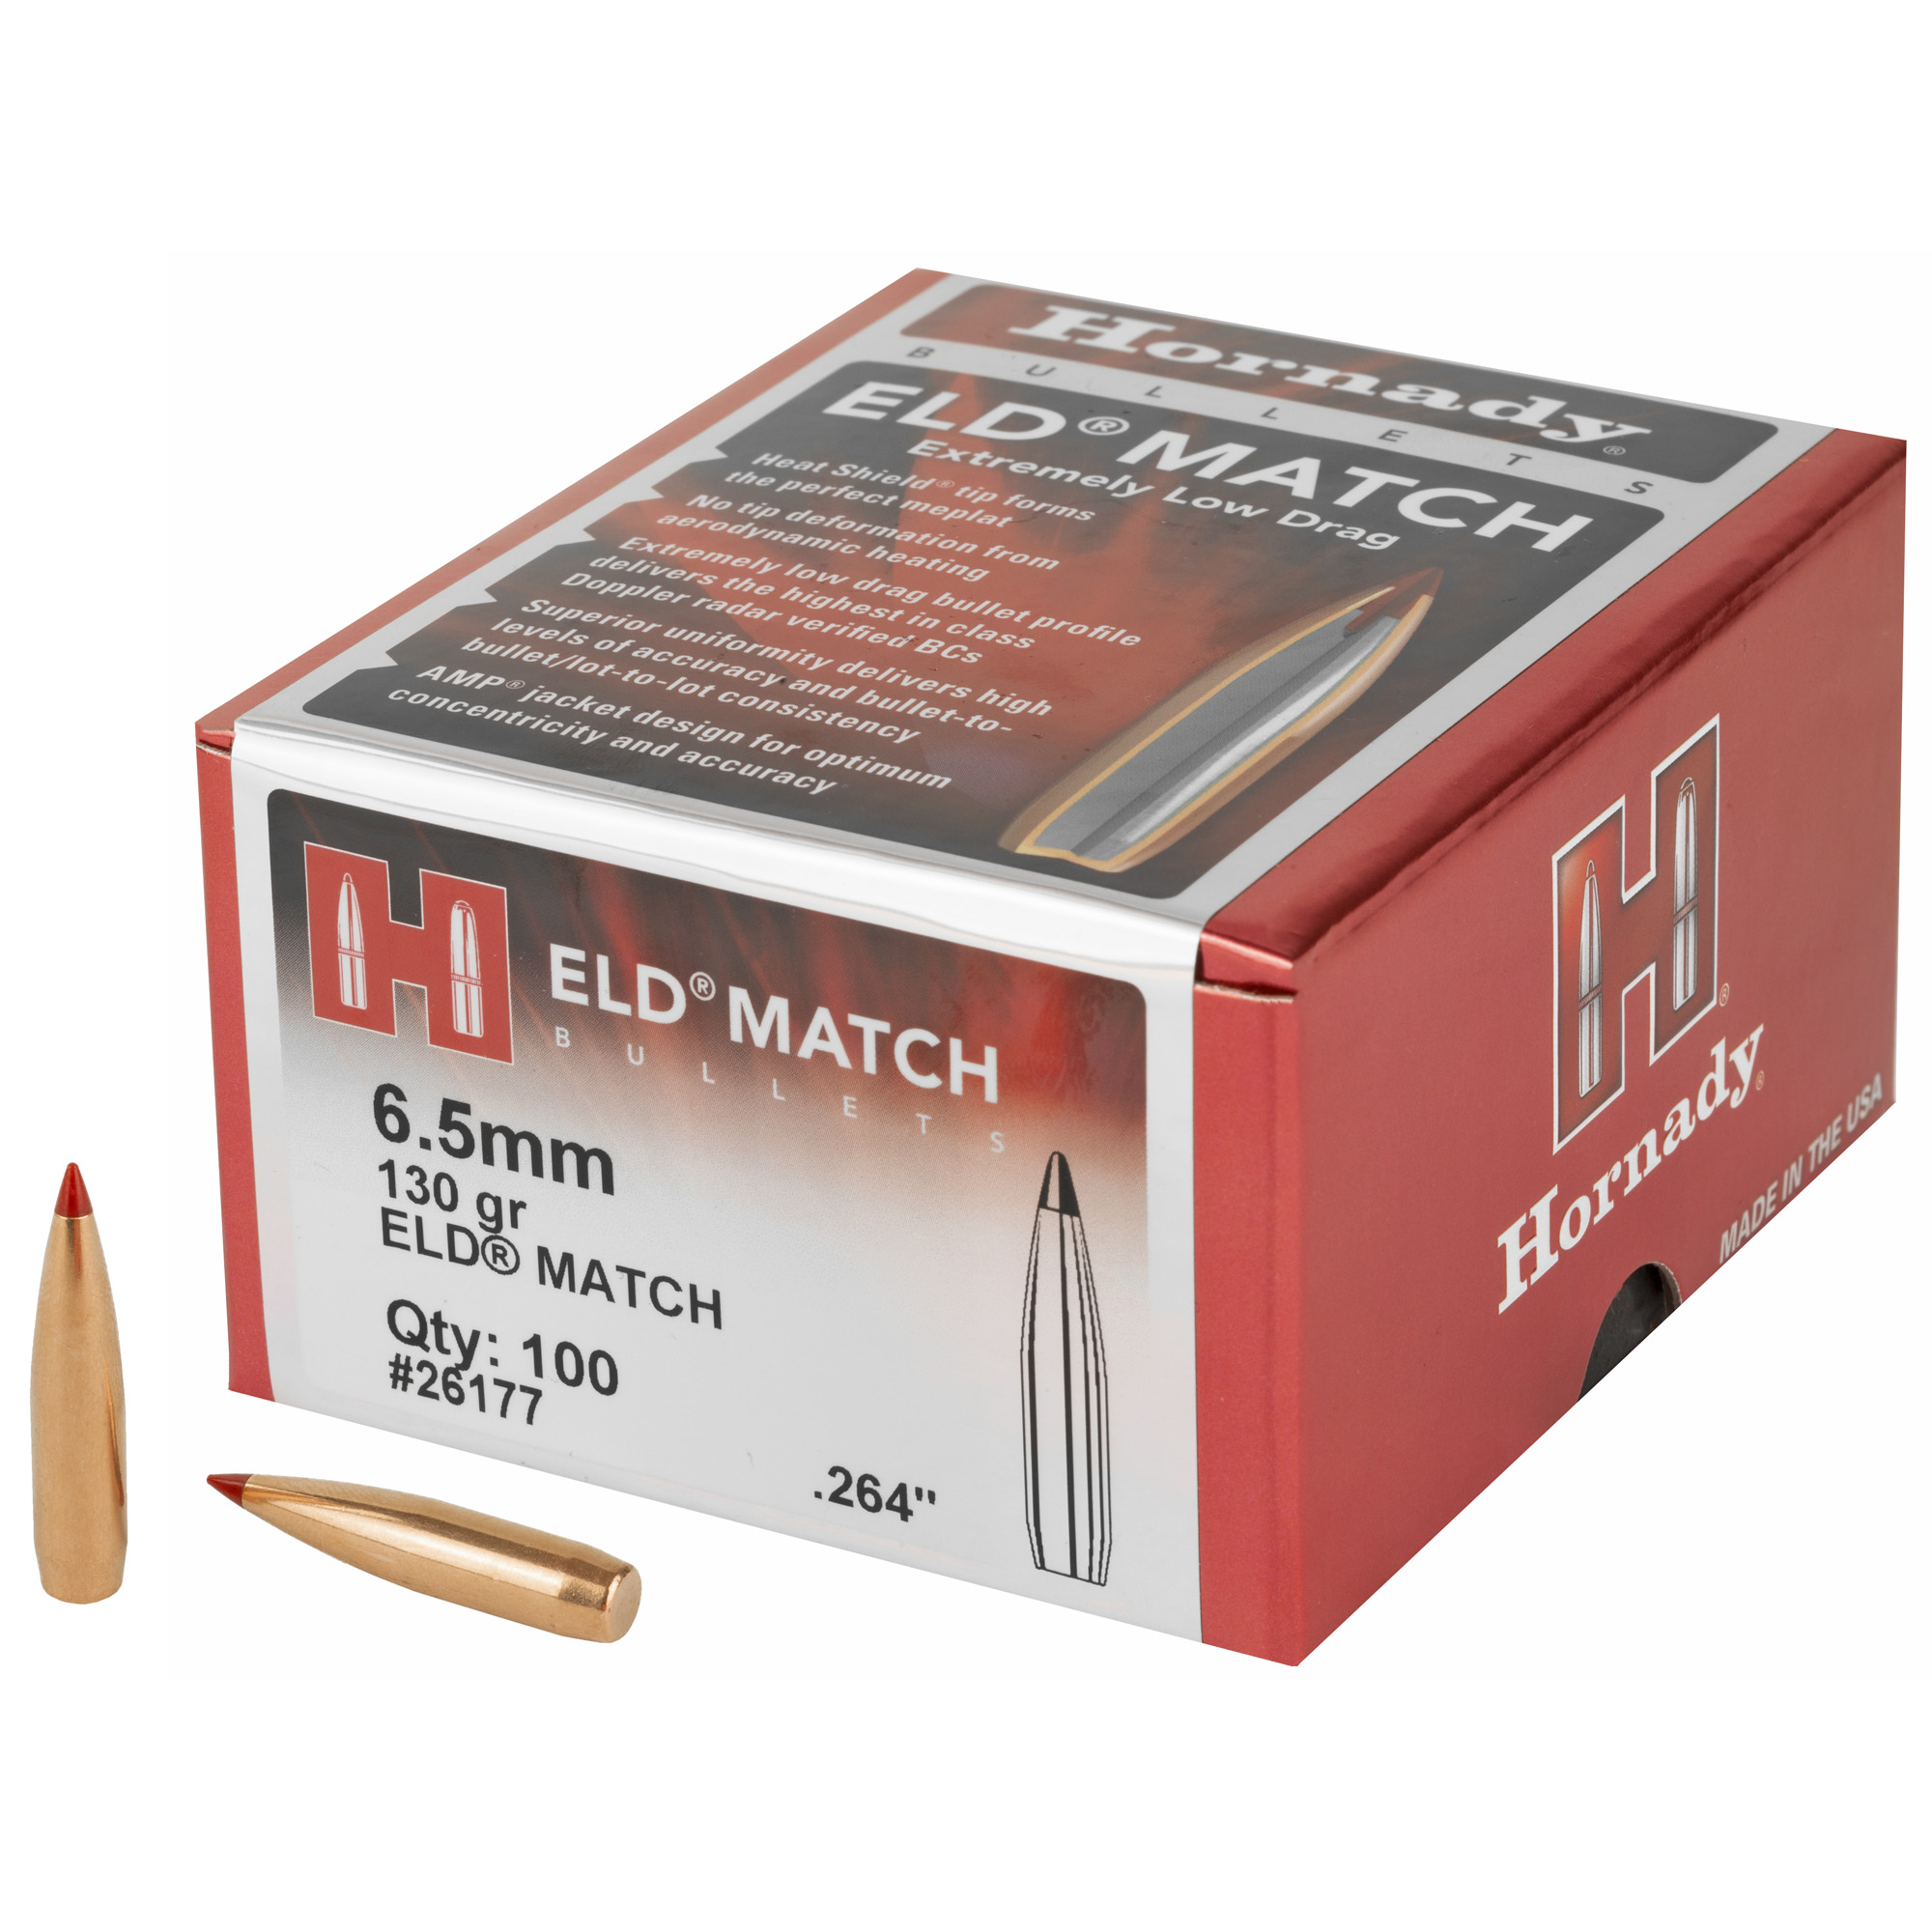 Hrndy Eld-m 6.5mm .264 130gr 100ct